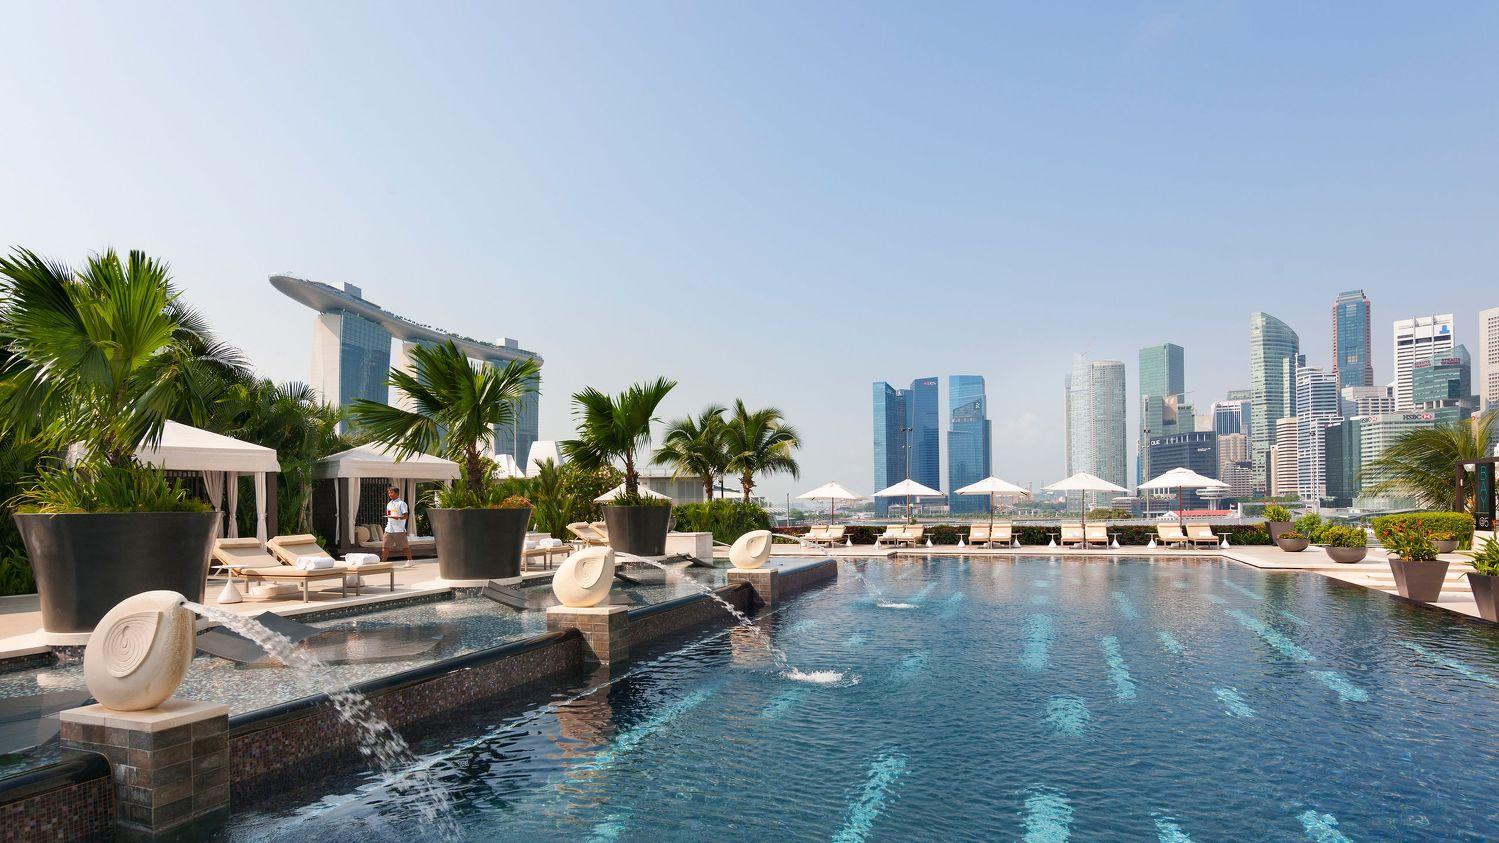 Mandarin Oriental Singapore Outdoor Pool - THE EDGE SINGAPORE